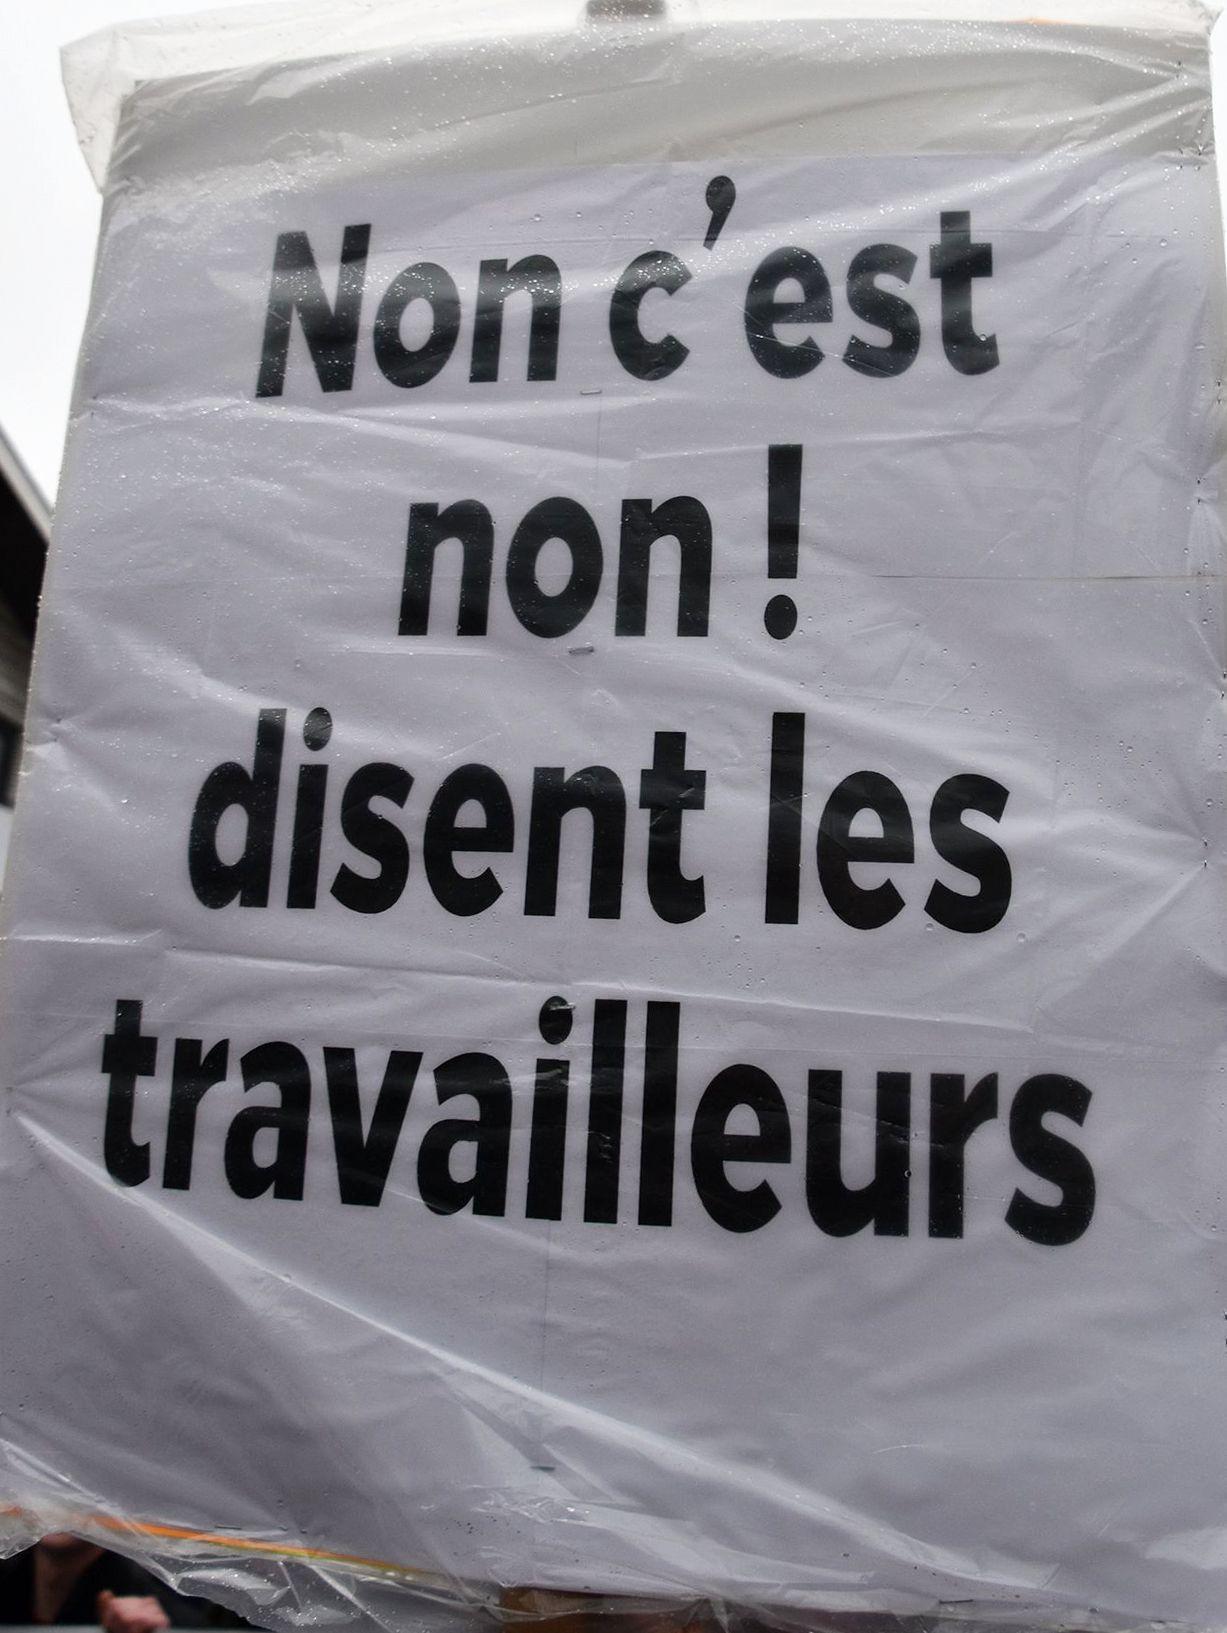 https://cpcml.ca/francais/Images2019/Slogans/170501-MontrealPremierMai-55.jpg